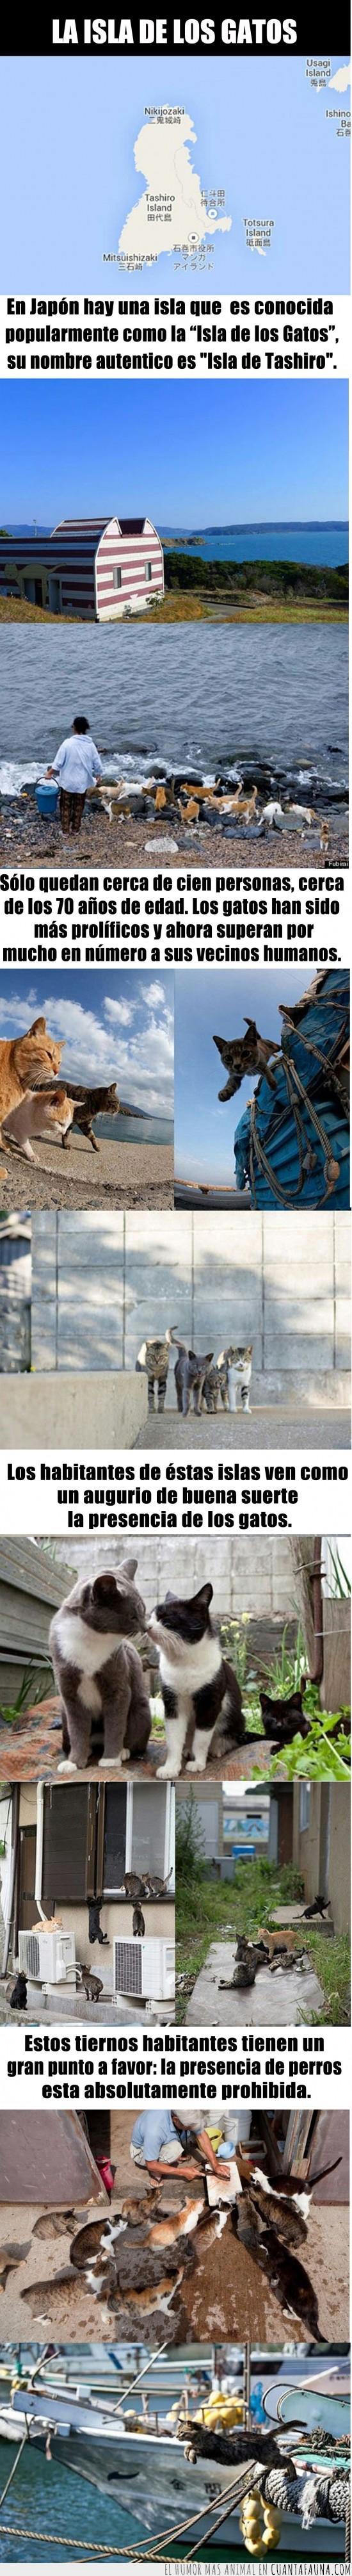 curiosidad,gatos,hogar,isla,japon,tashiro